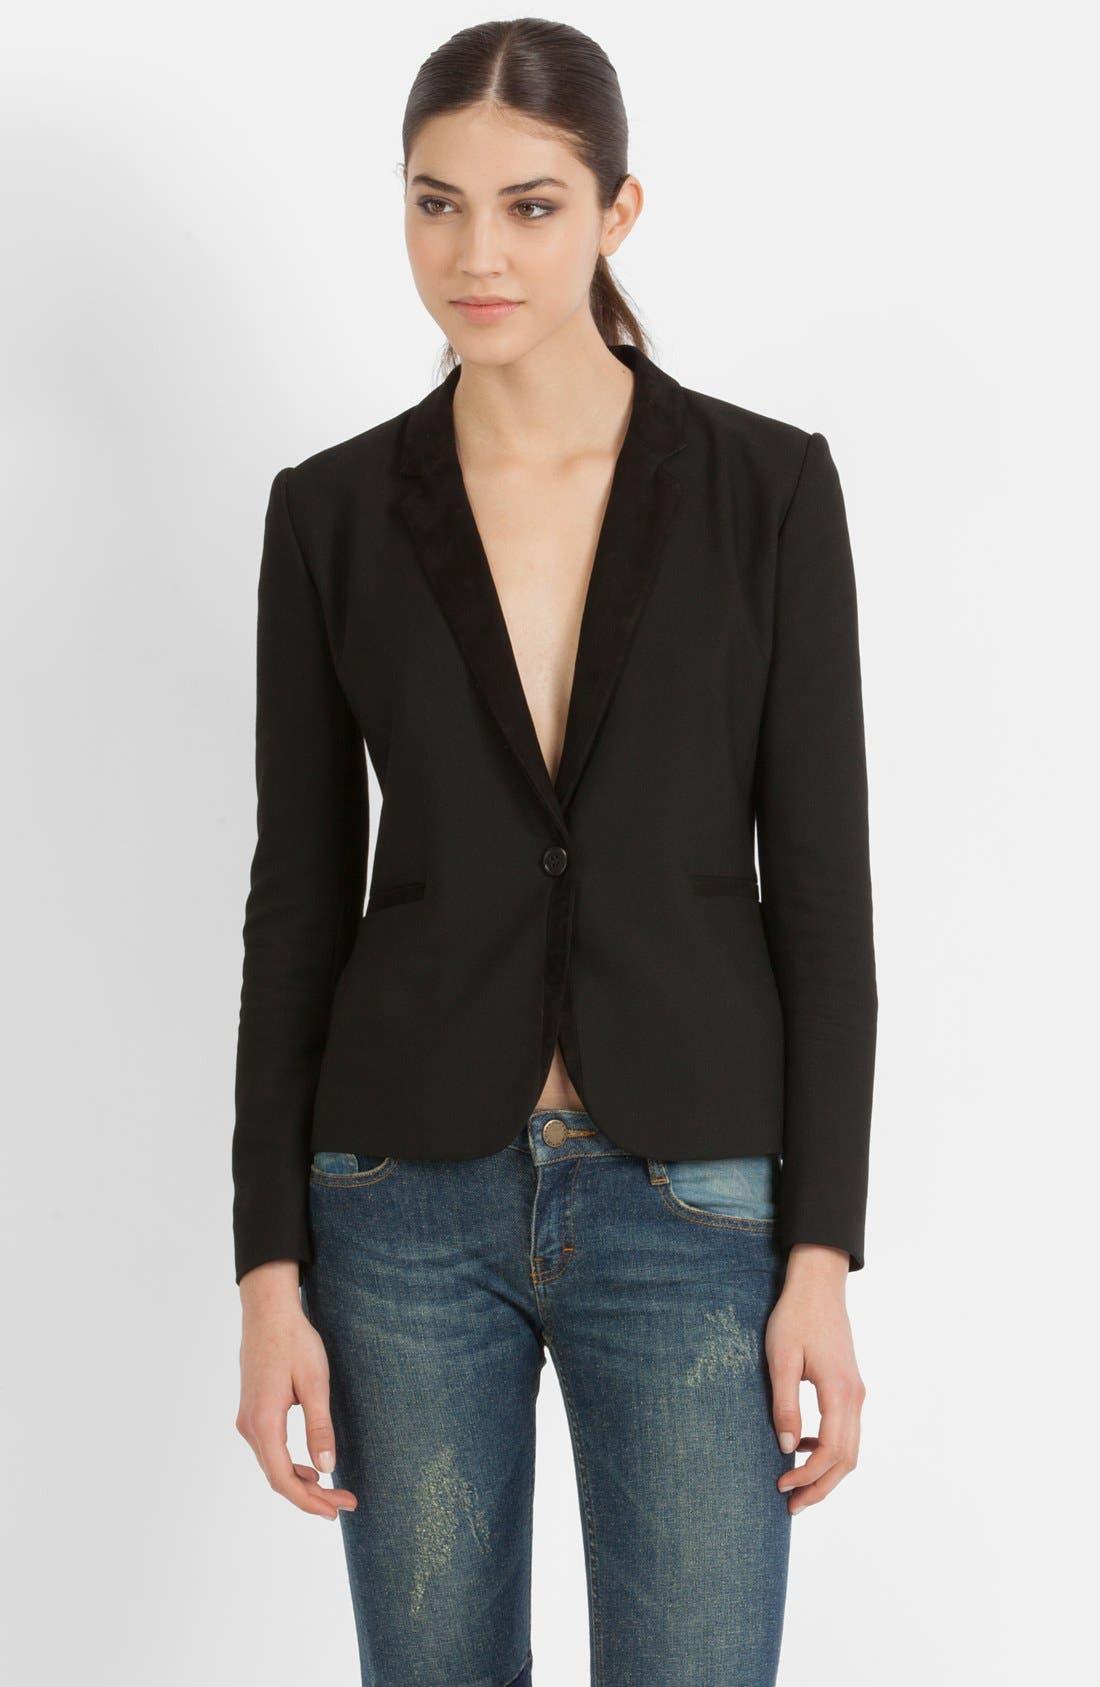 Main Image - maje 'Veste Cintree' Leather Accent Blazer